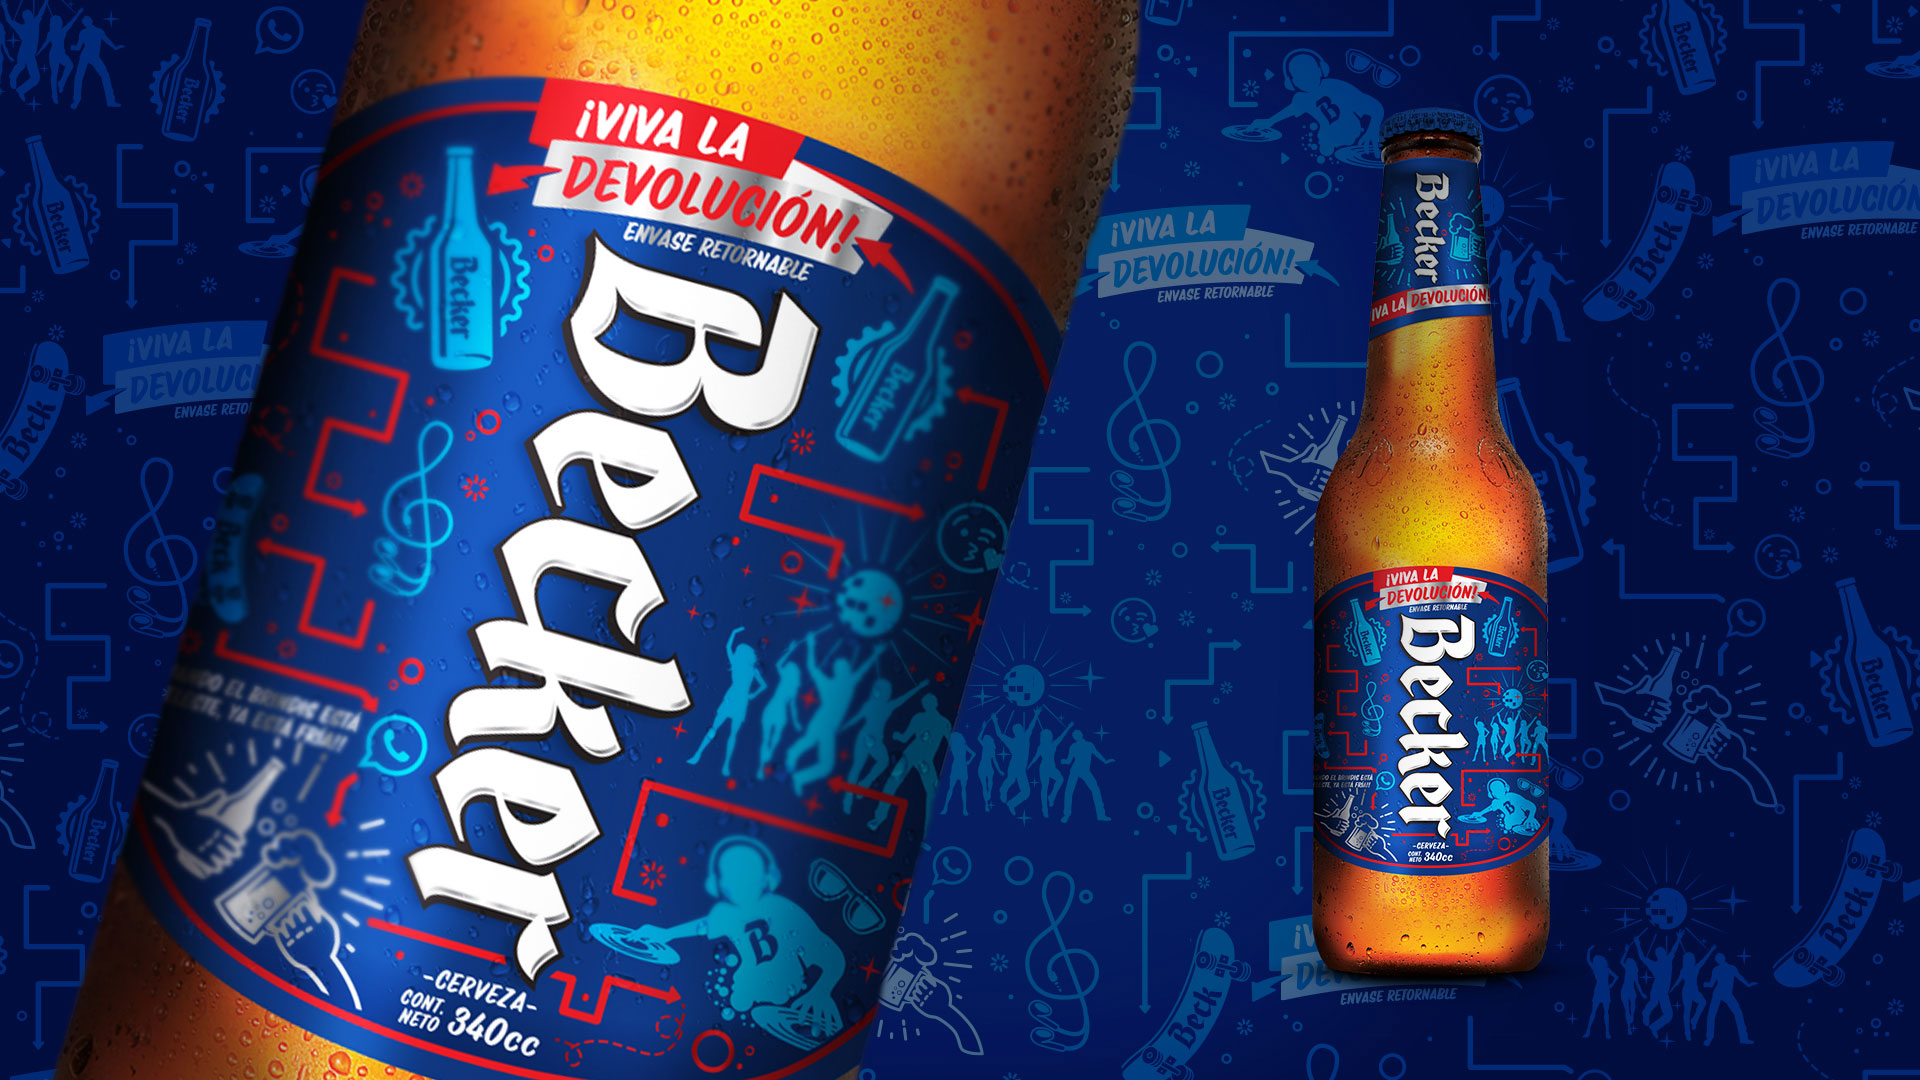 ¡Viva la Devolución! Becker Beer / World Brand Design Society